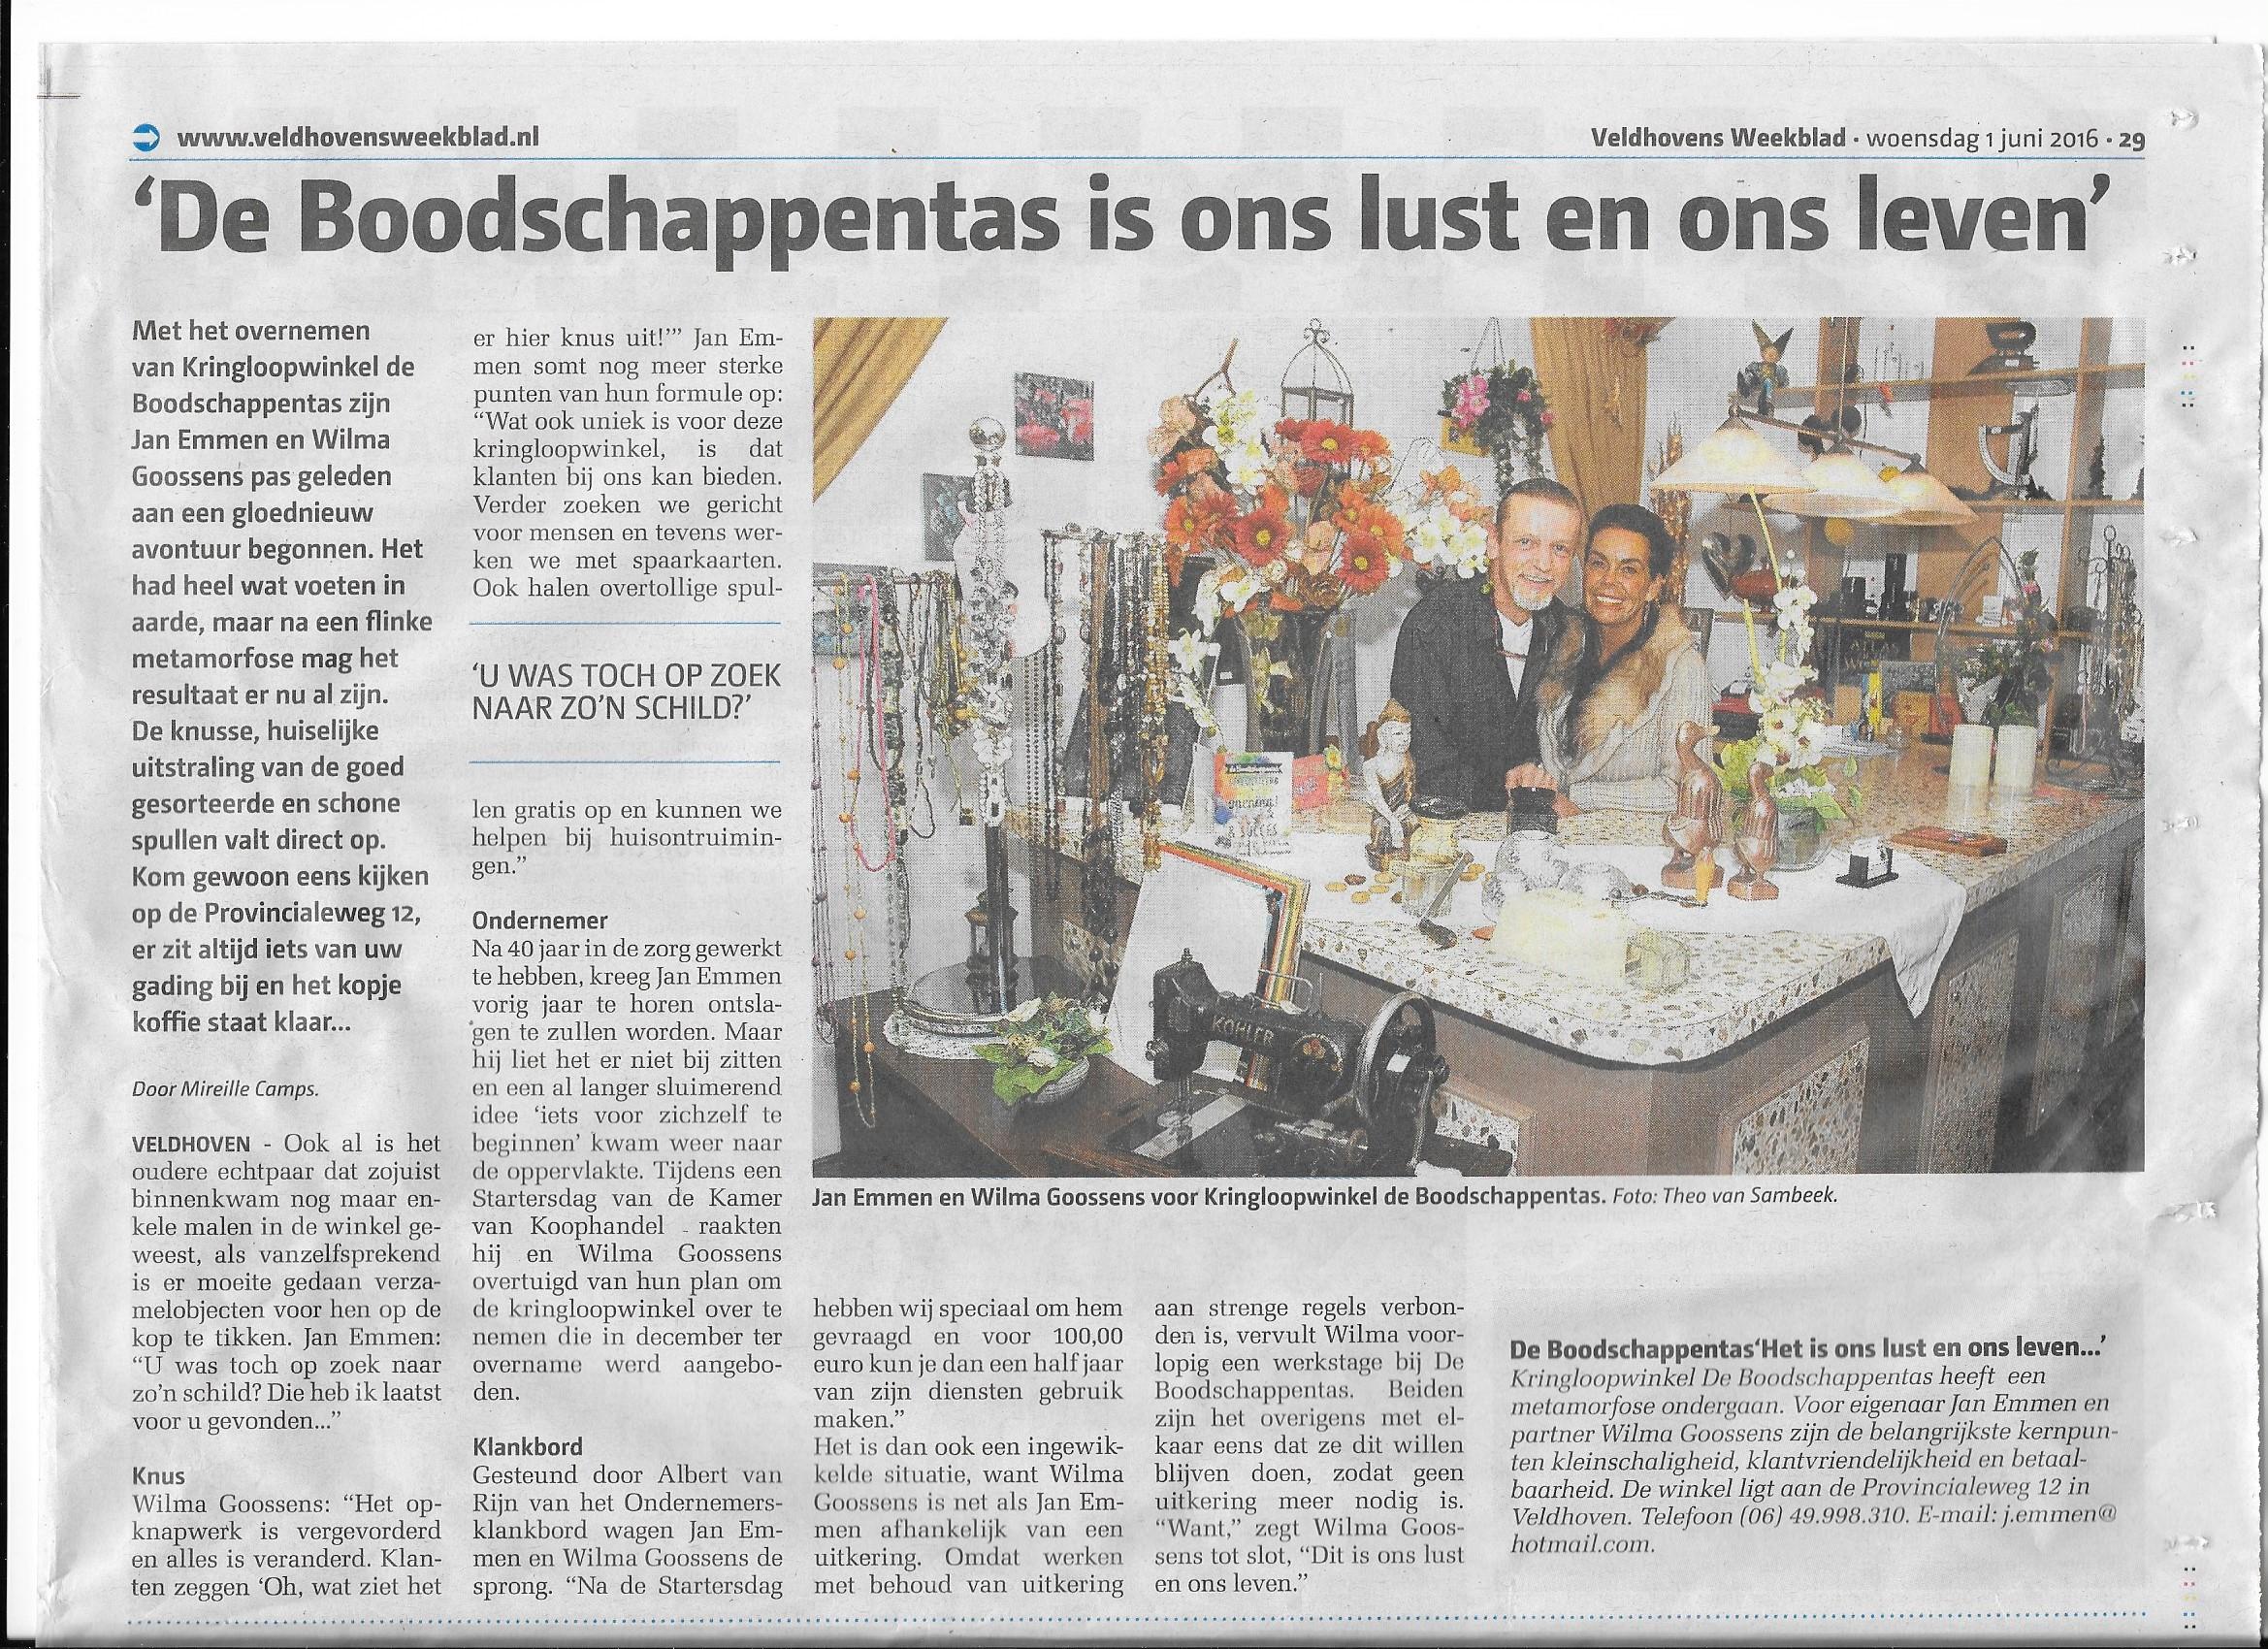 Met gepaste trots, het artikel in het Veldhovens weekblad van 1 juni